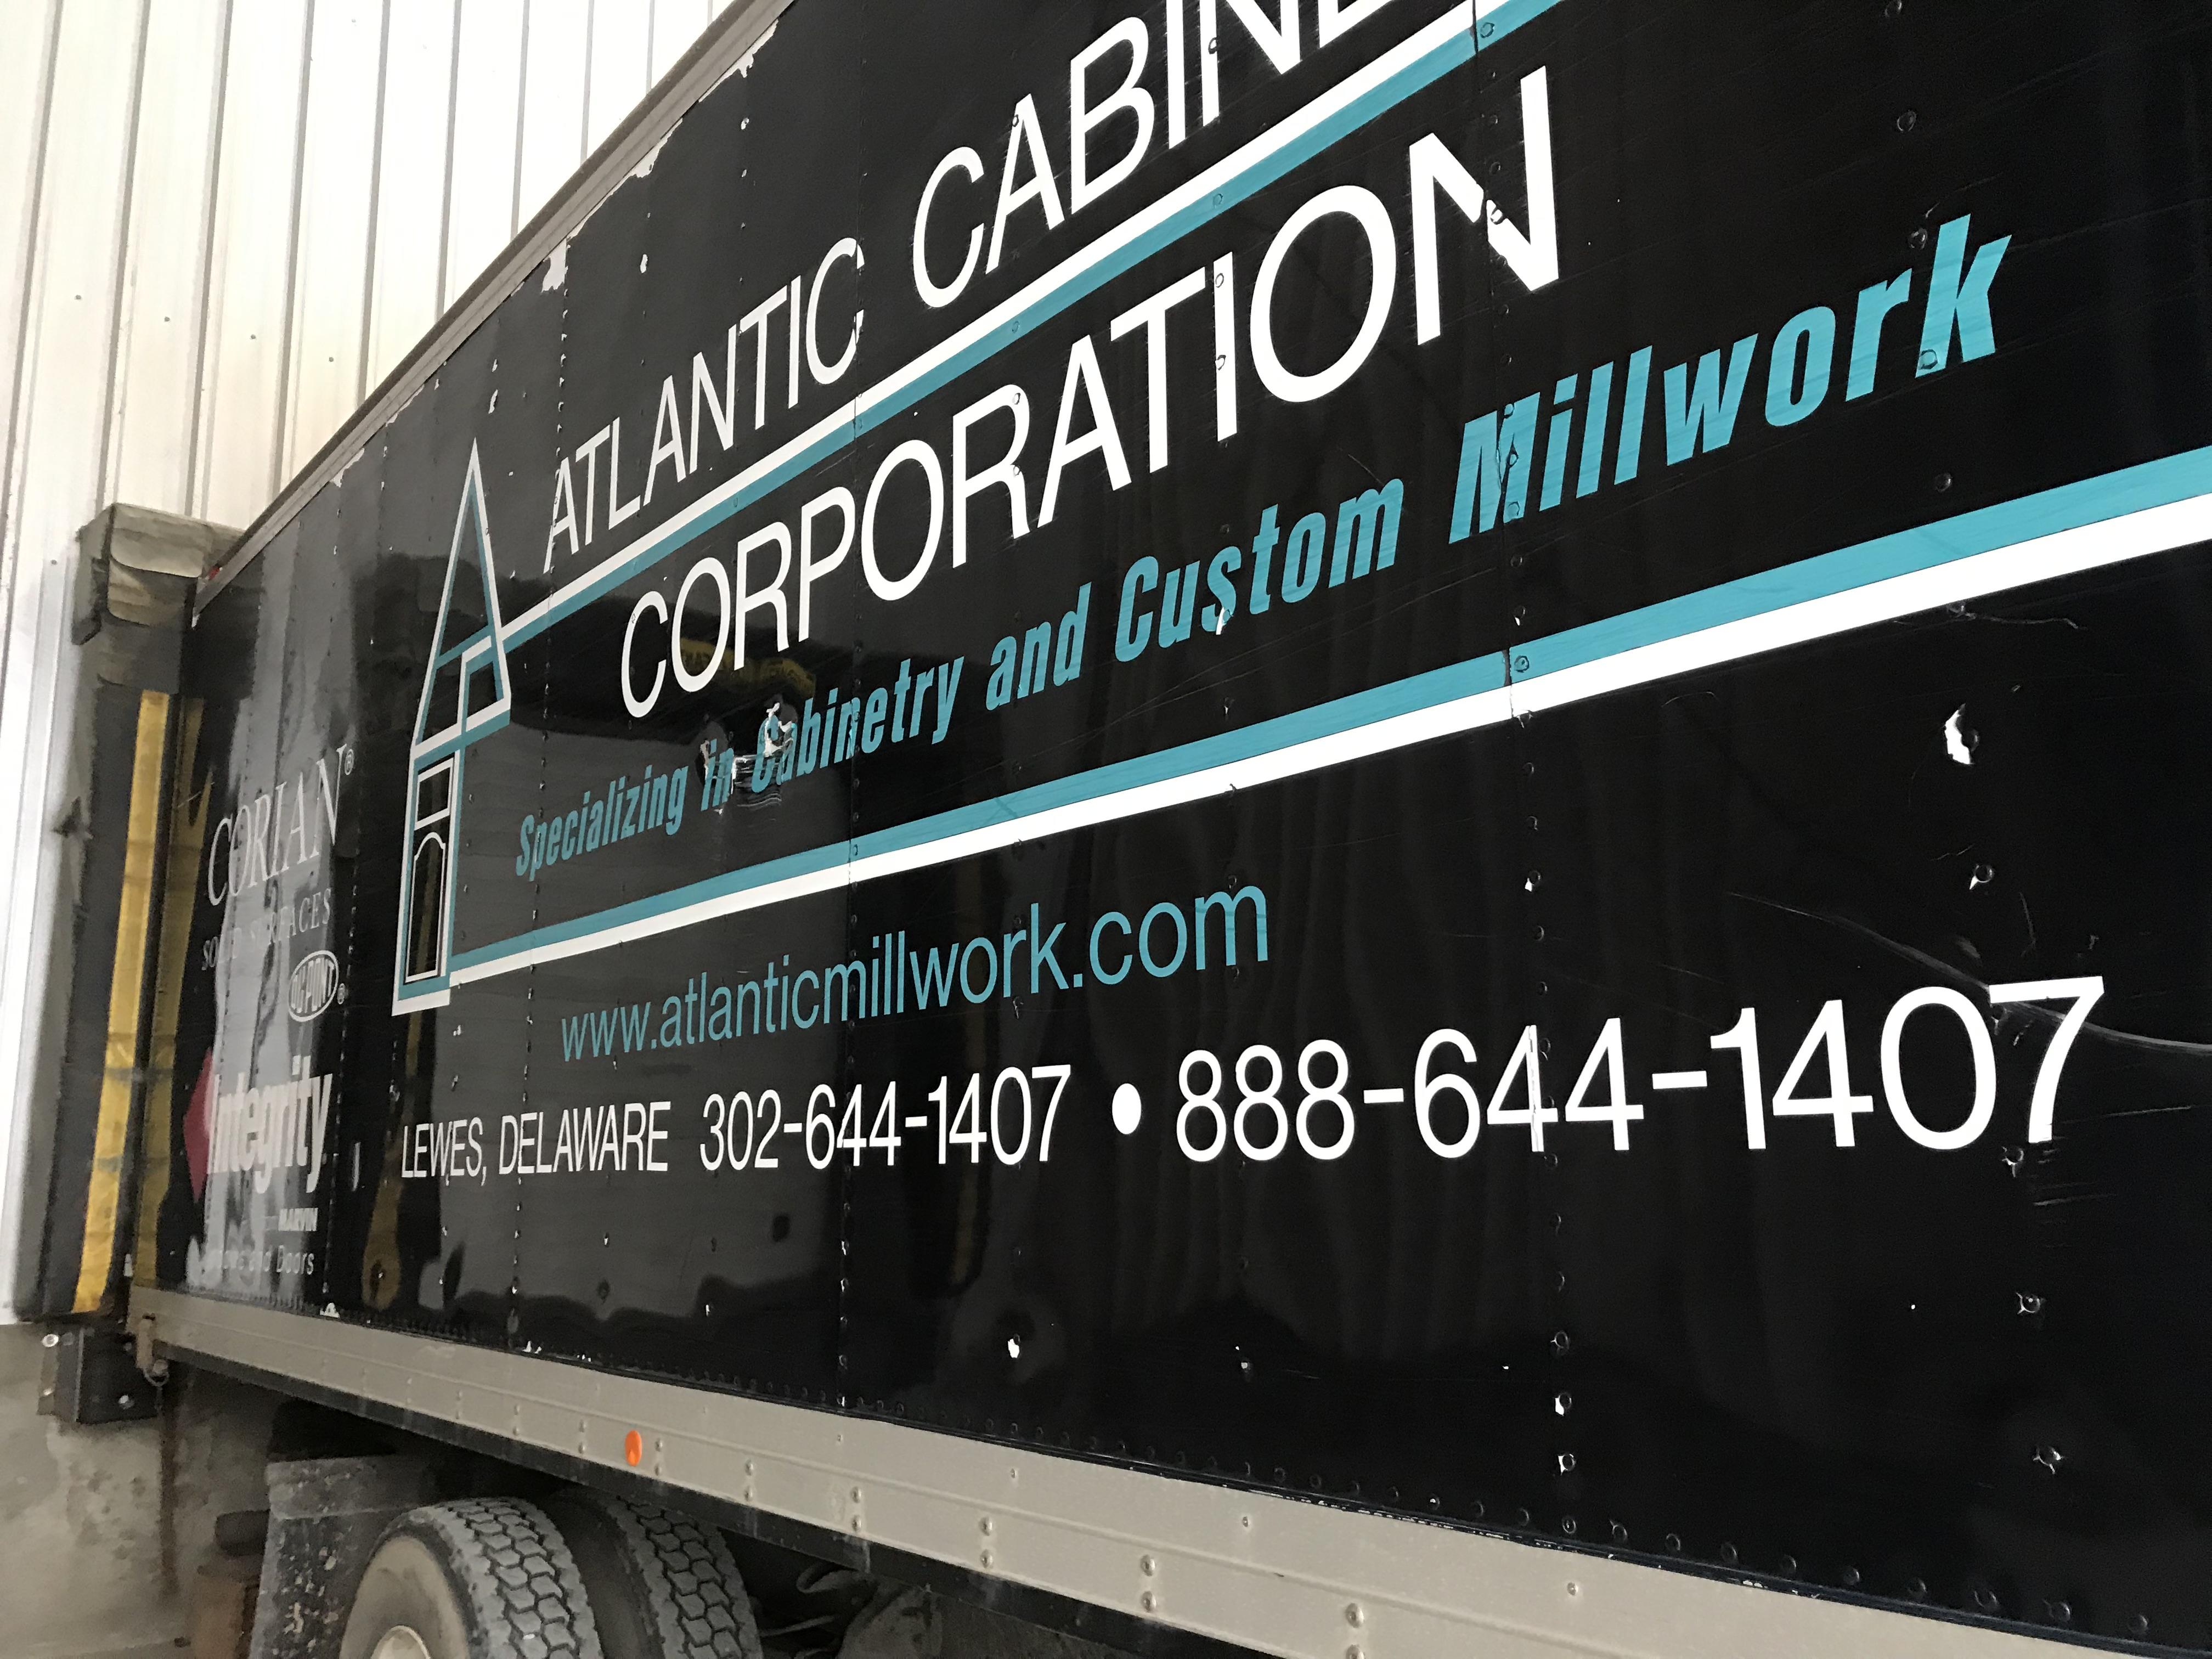 atlantic millwork 3